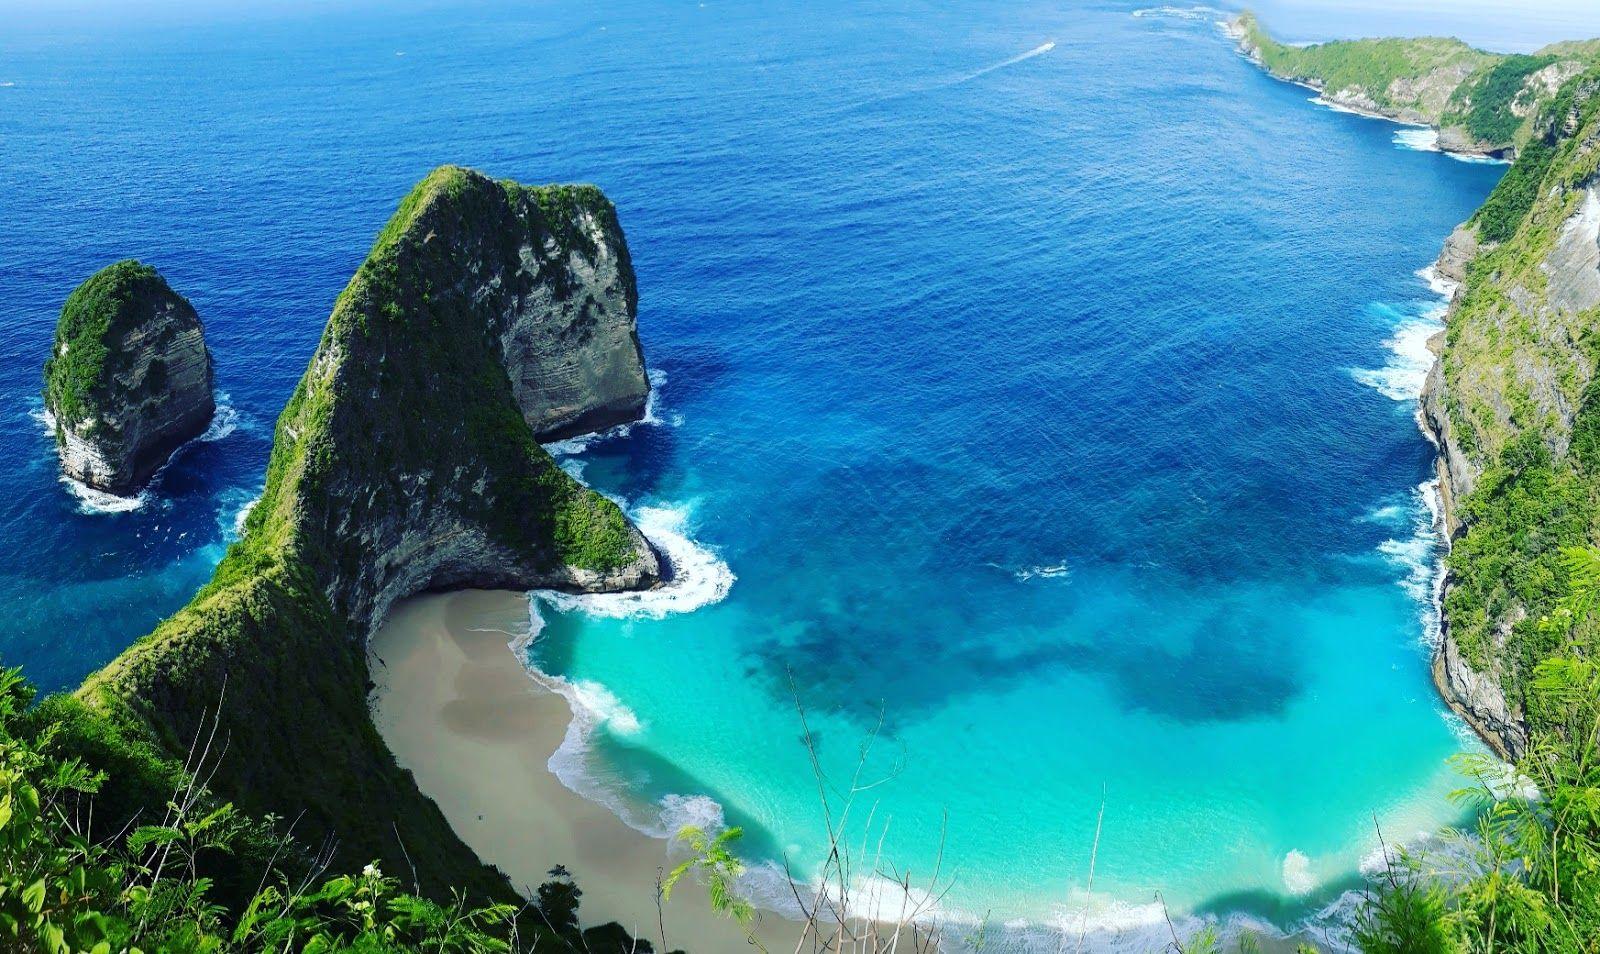 Nusa Penida Tour Snorkeling Private Day Trip Travel Bali Paket Honeymoon 4 Hari 3 Malam Update 2018